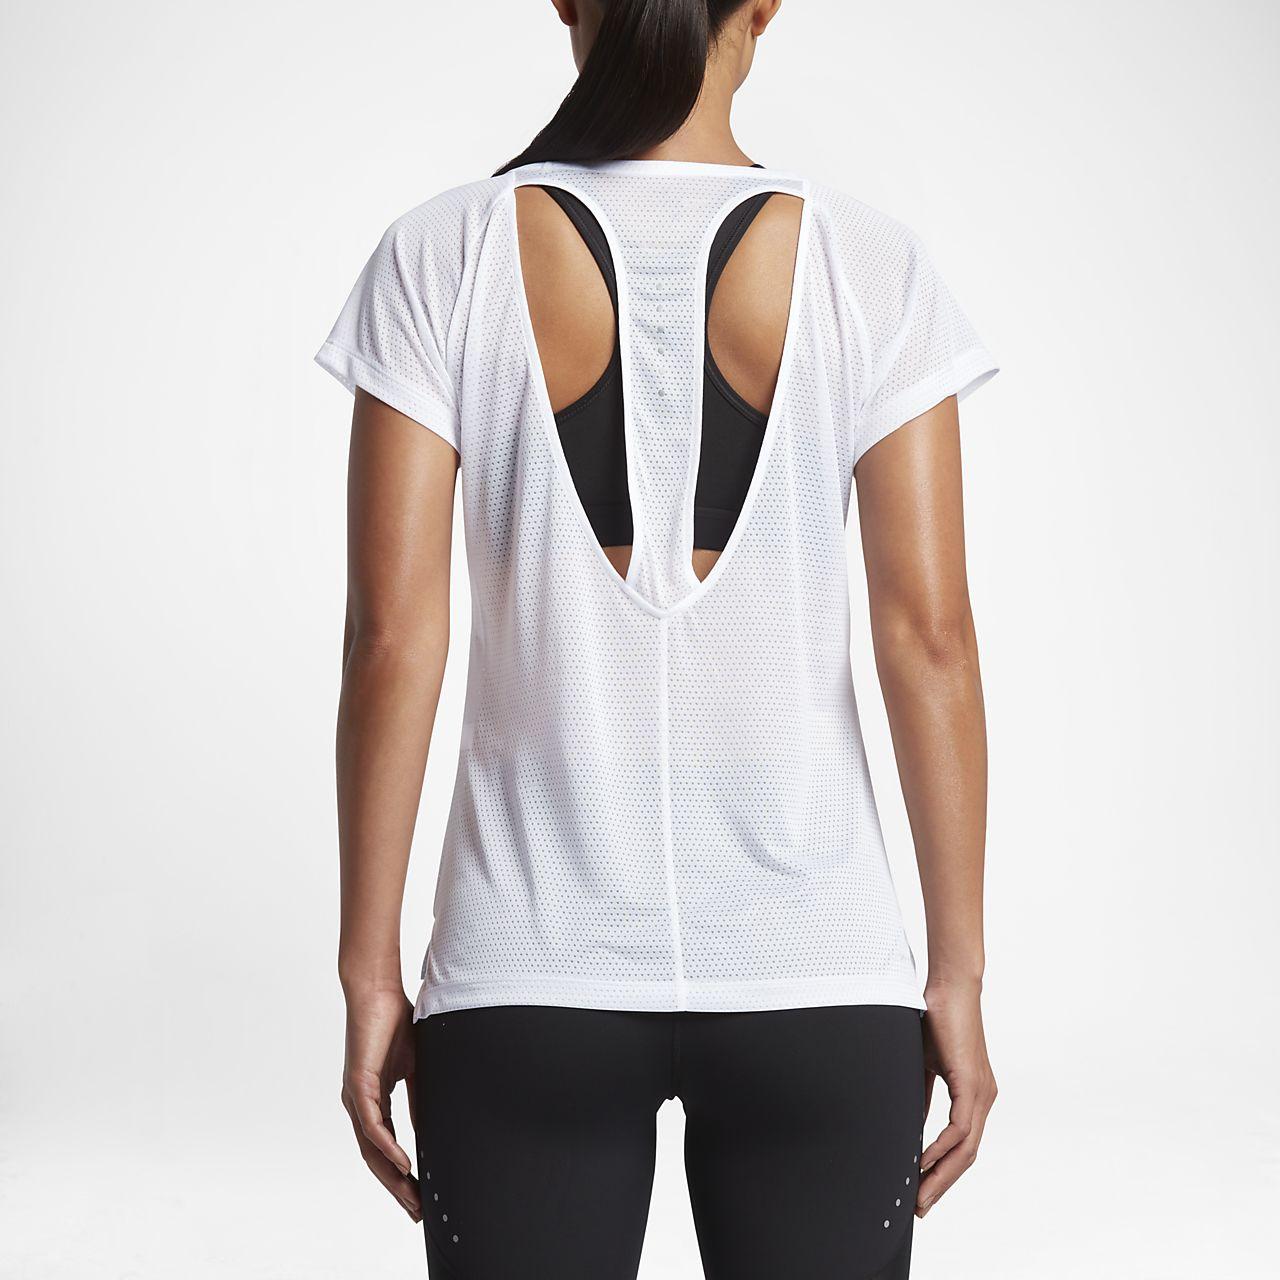 Nike Breathe Women's Short Sleeve Running Tops White/Heather